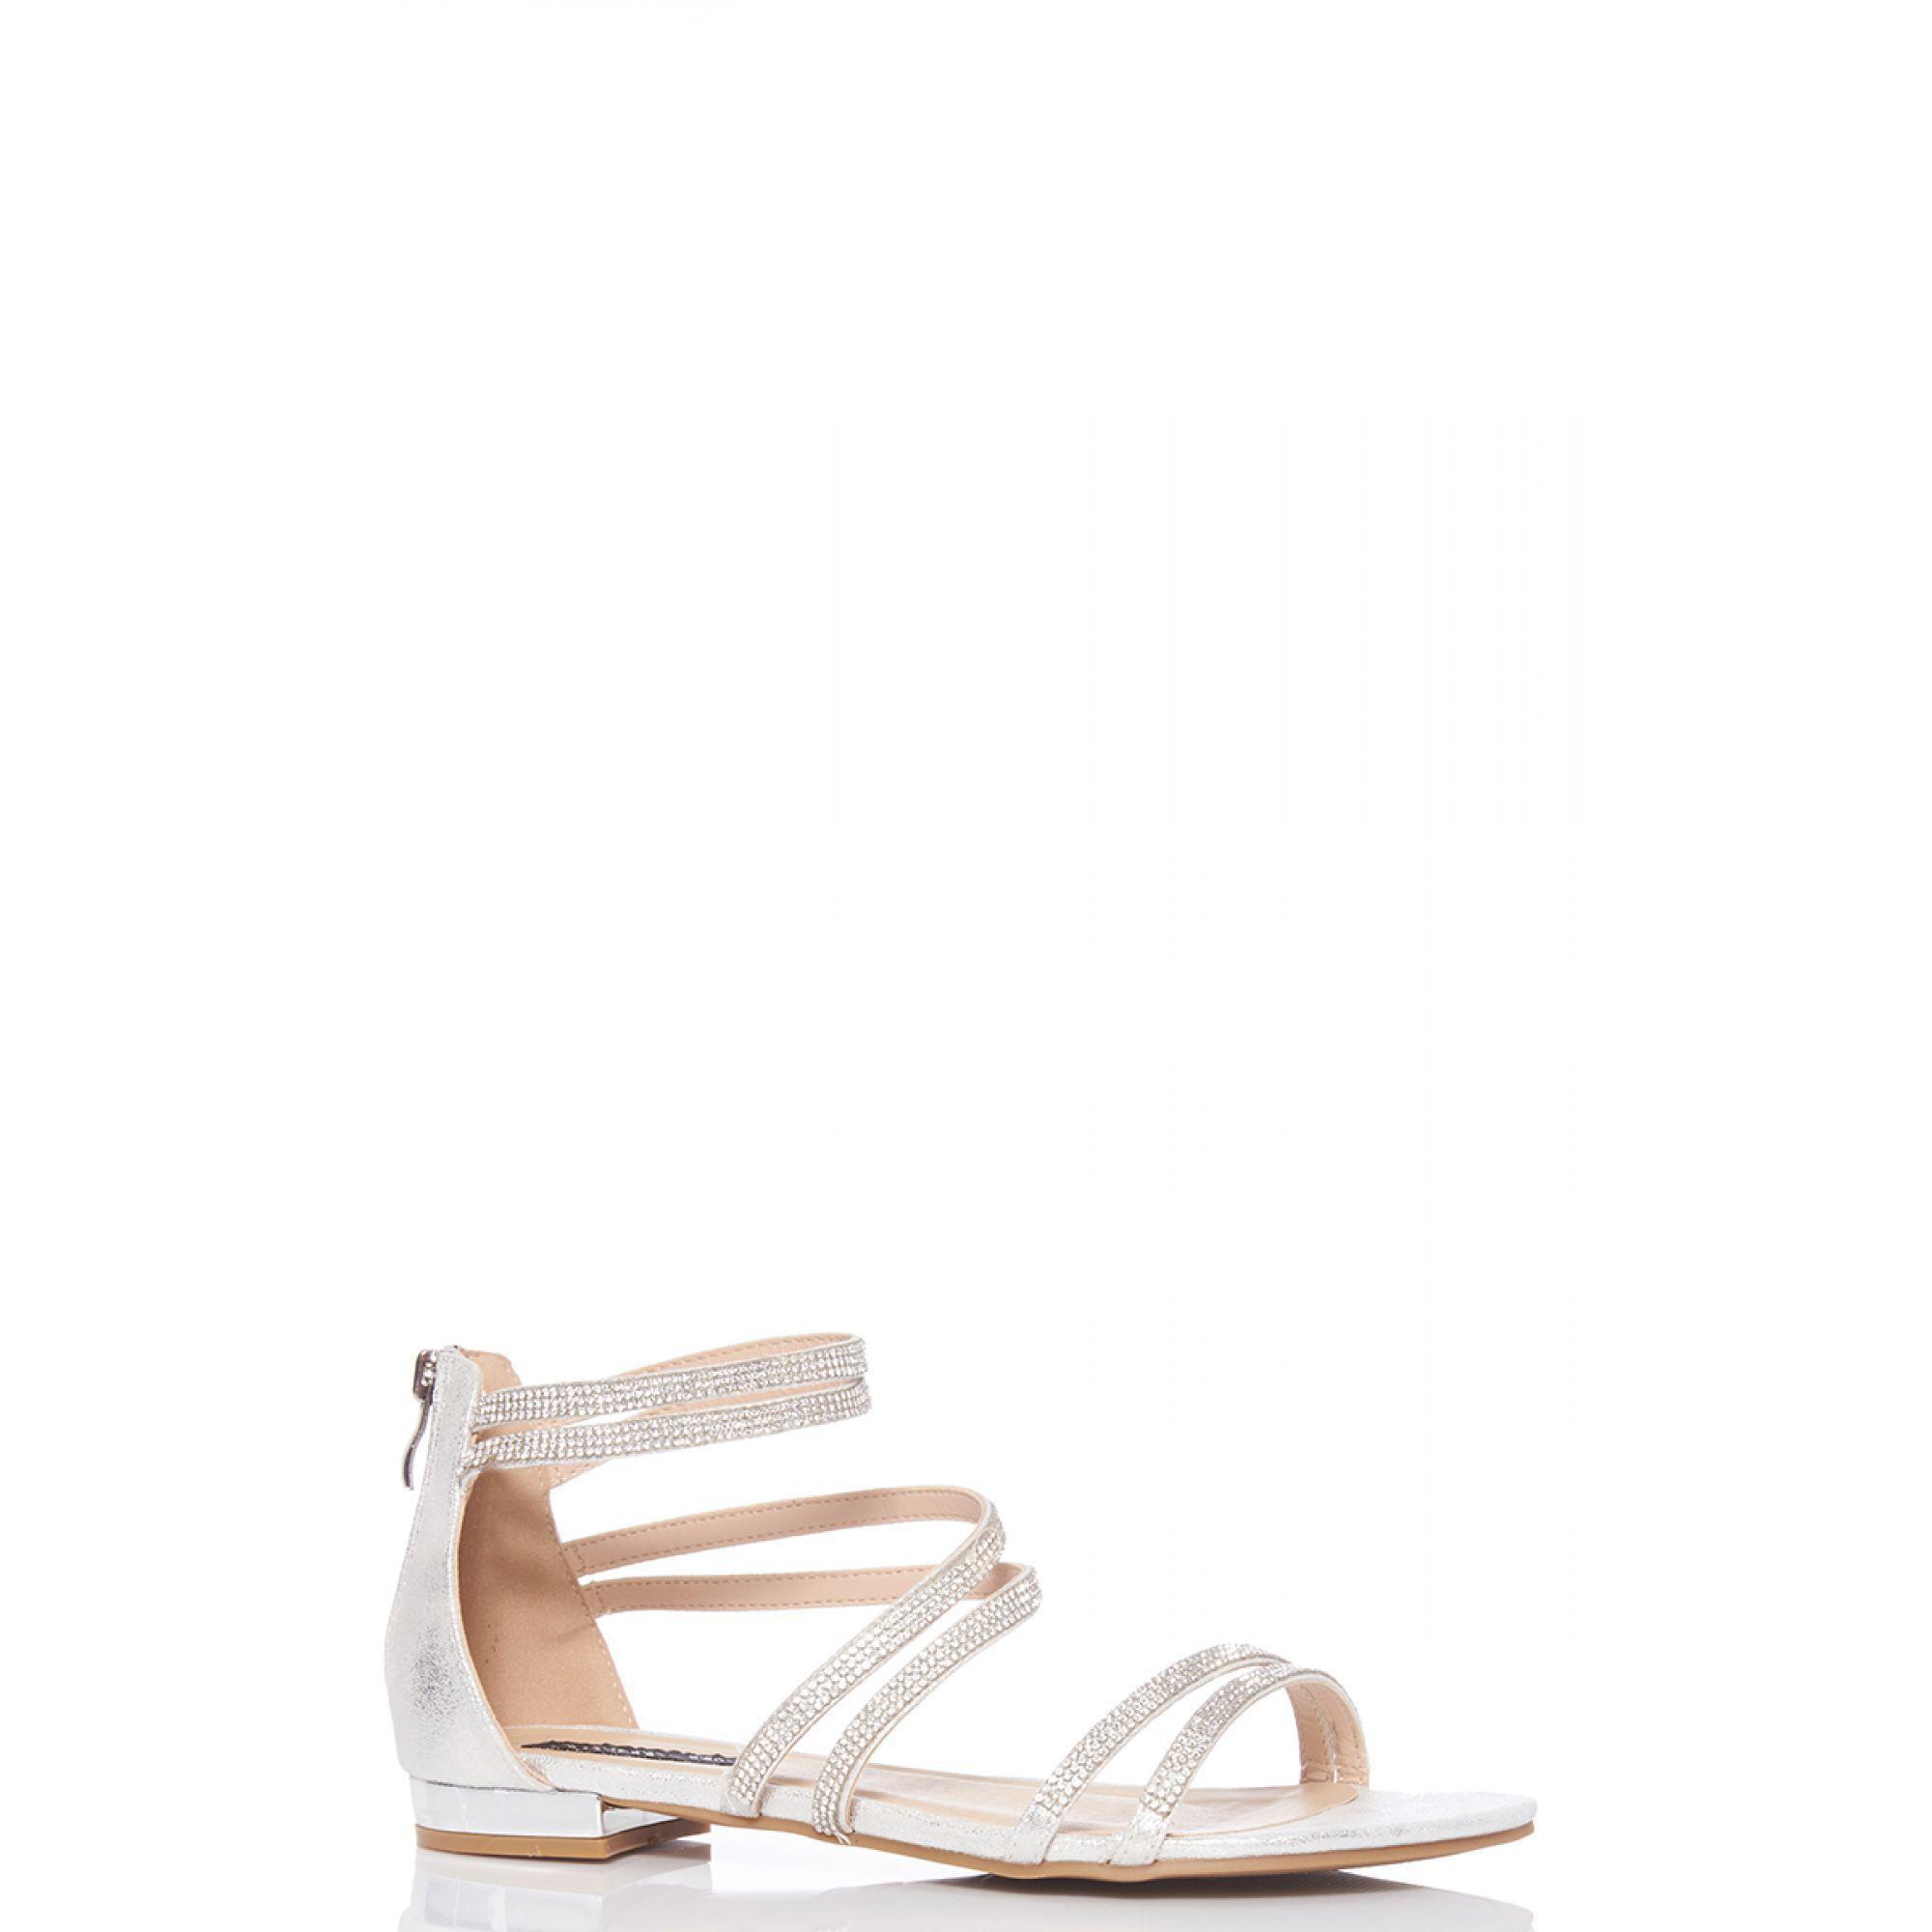 ee3ac92073216 Quiz Silver Diamante Strap Flat Sandals in Metallic - Lyst